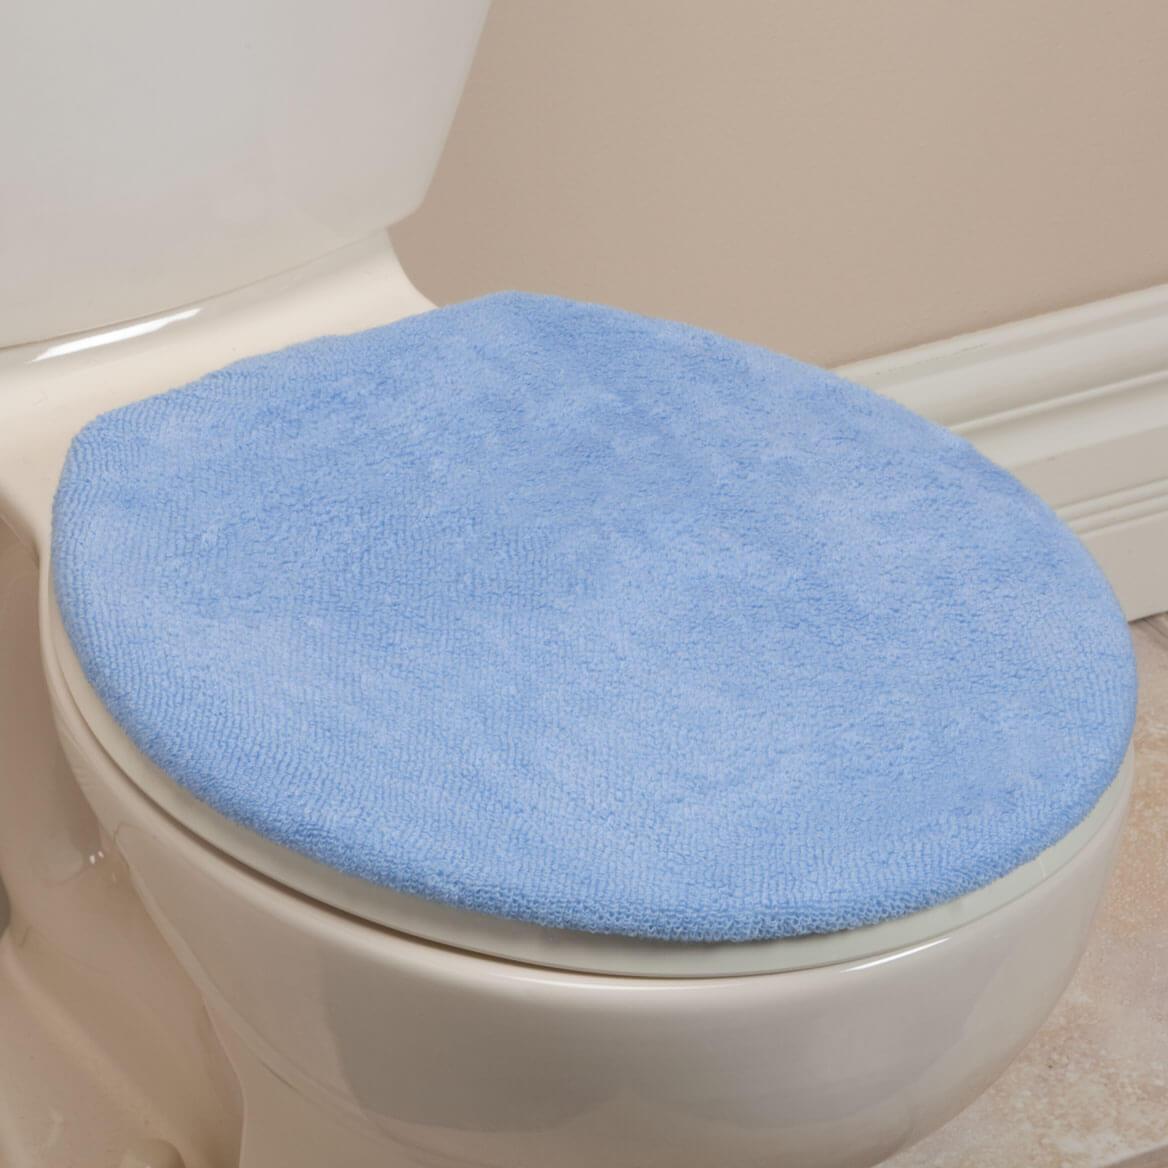 Decorative Toilet Lid Covers-336415